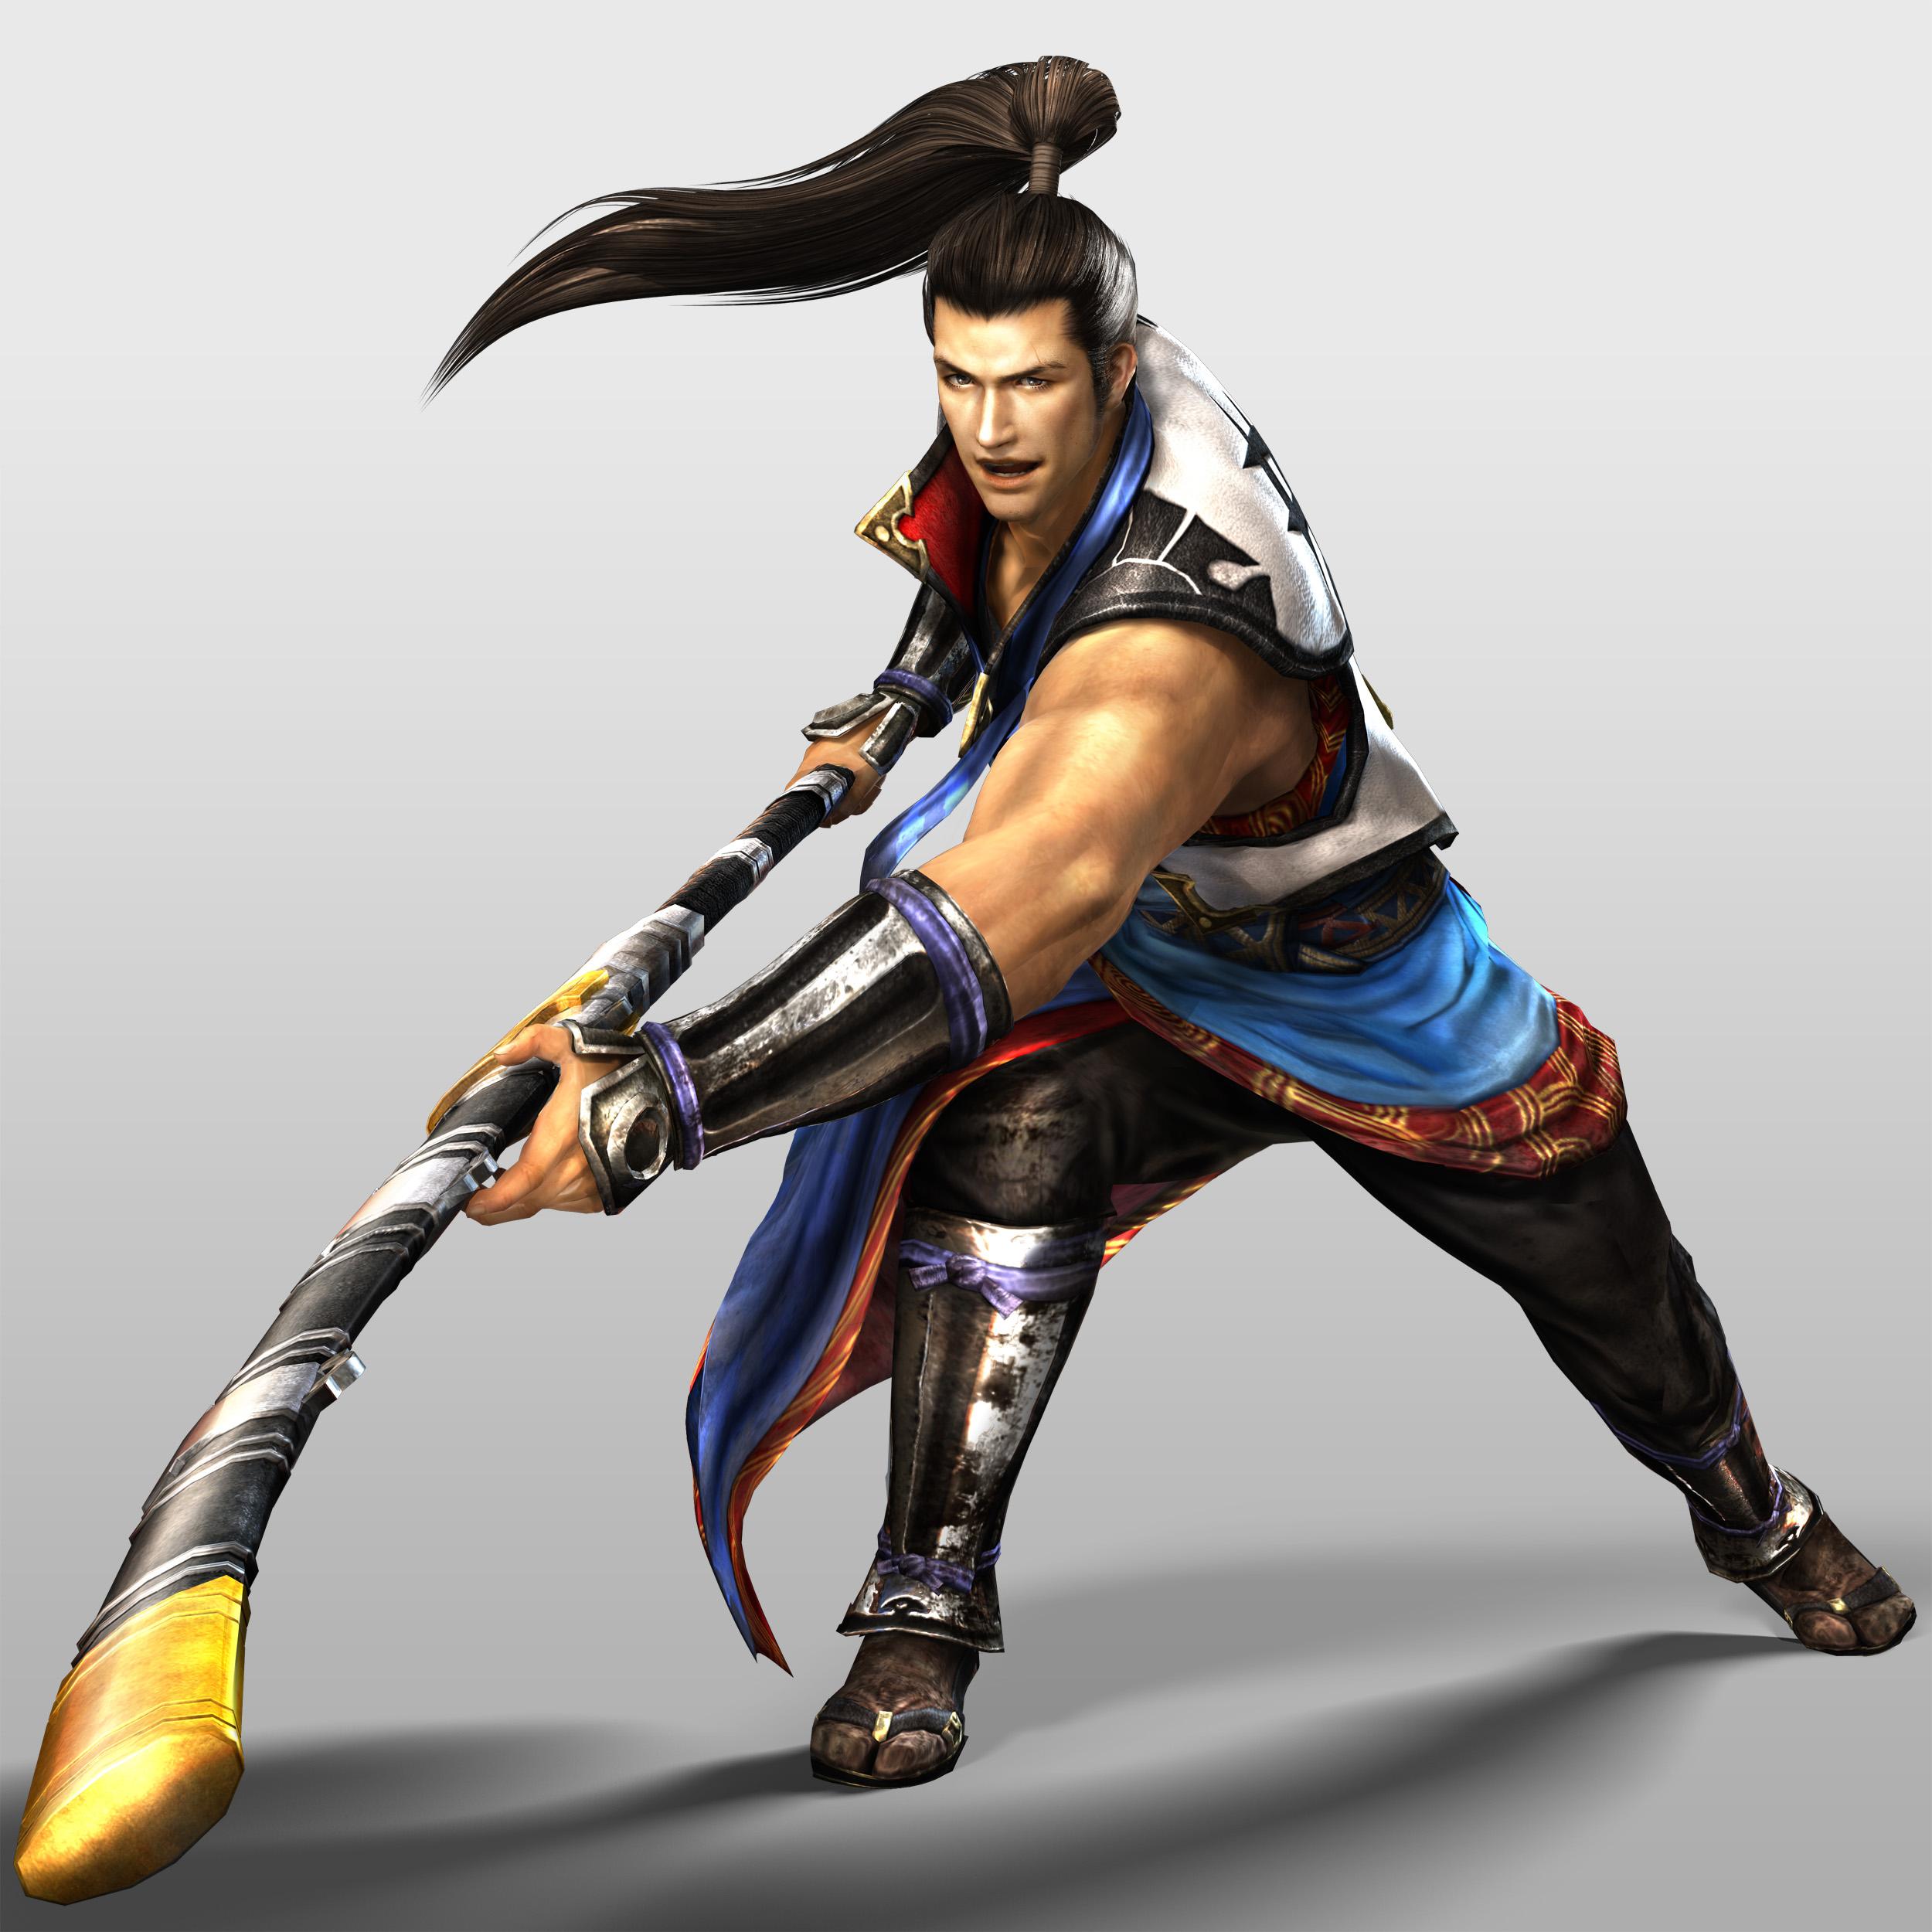 Warriors Orochi 3 Ultimate Vs Dynasty Warriors 8 Xtreme Legends: Image - Munenori-sw4.jpg